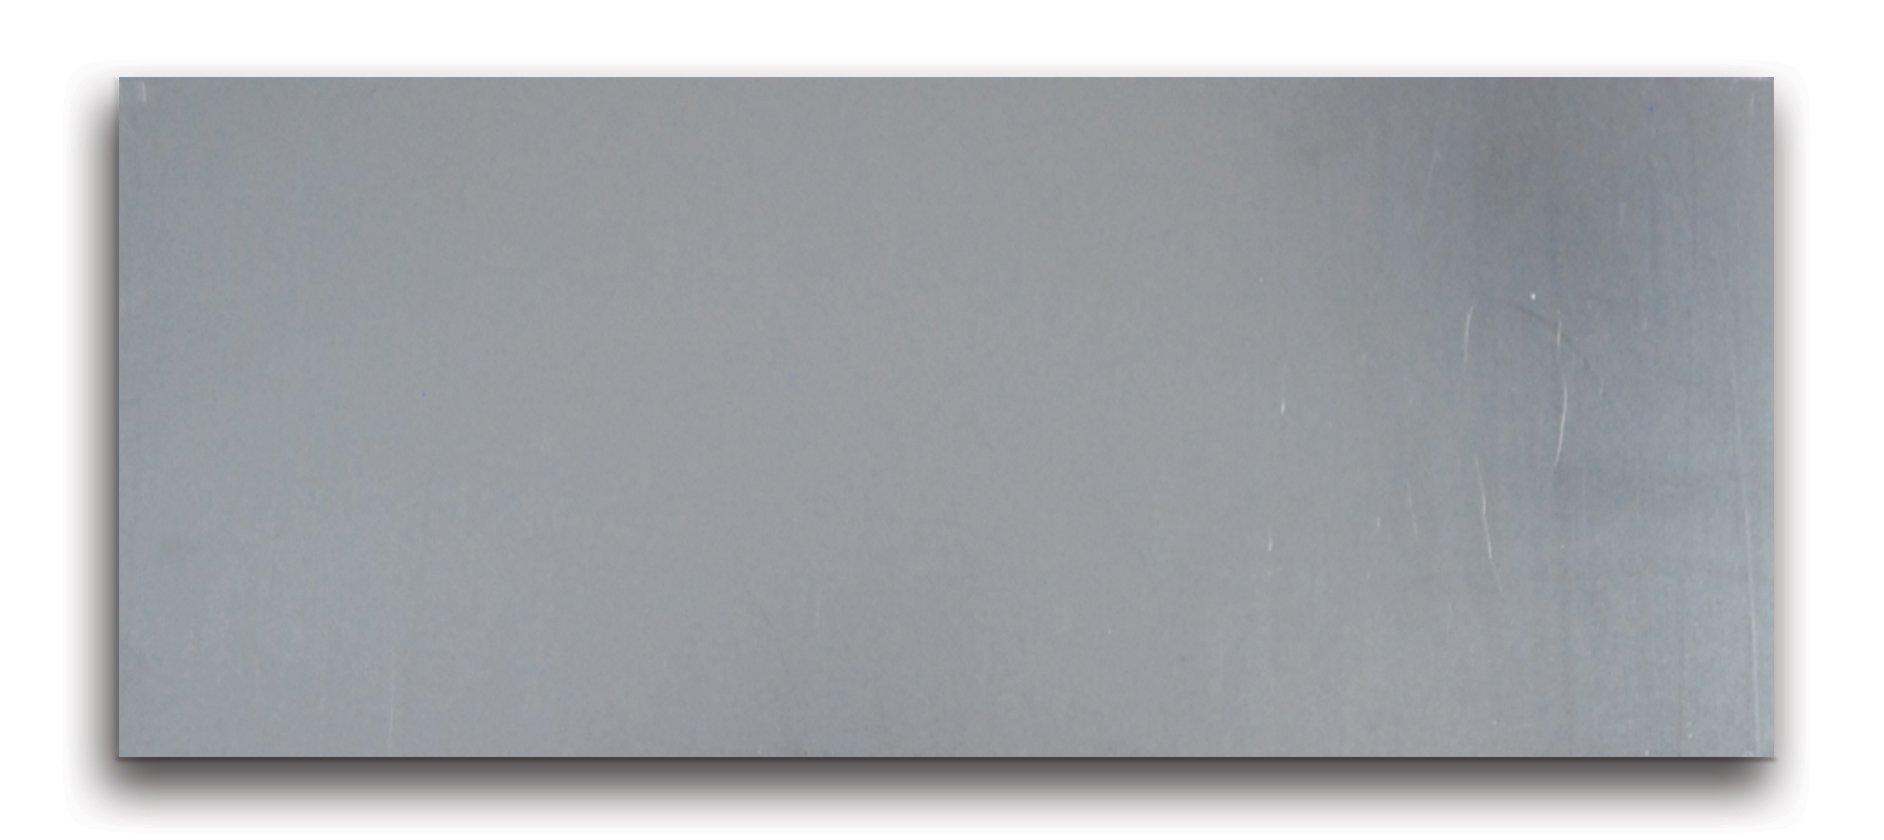 Remflex GS11838 Gasket Sheet by Remflex (Image #1)